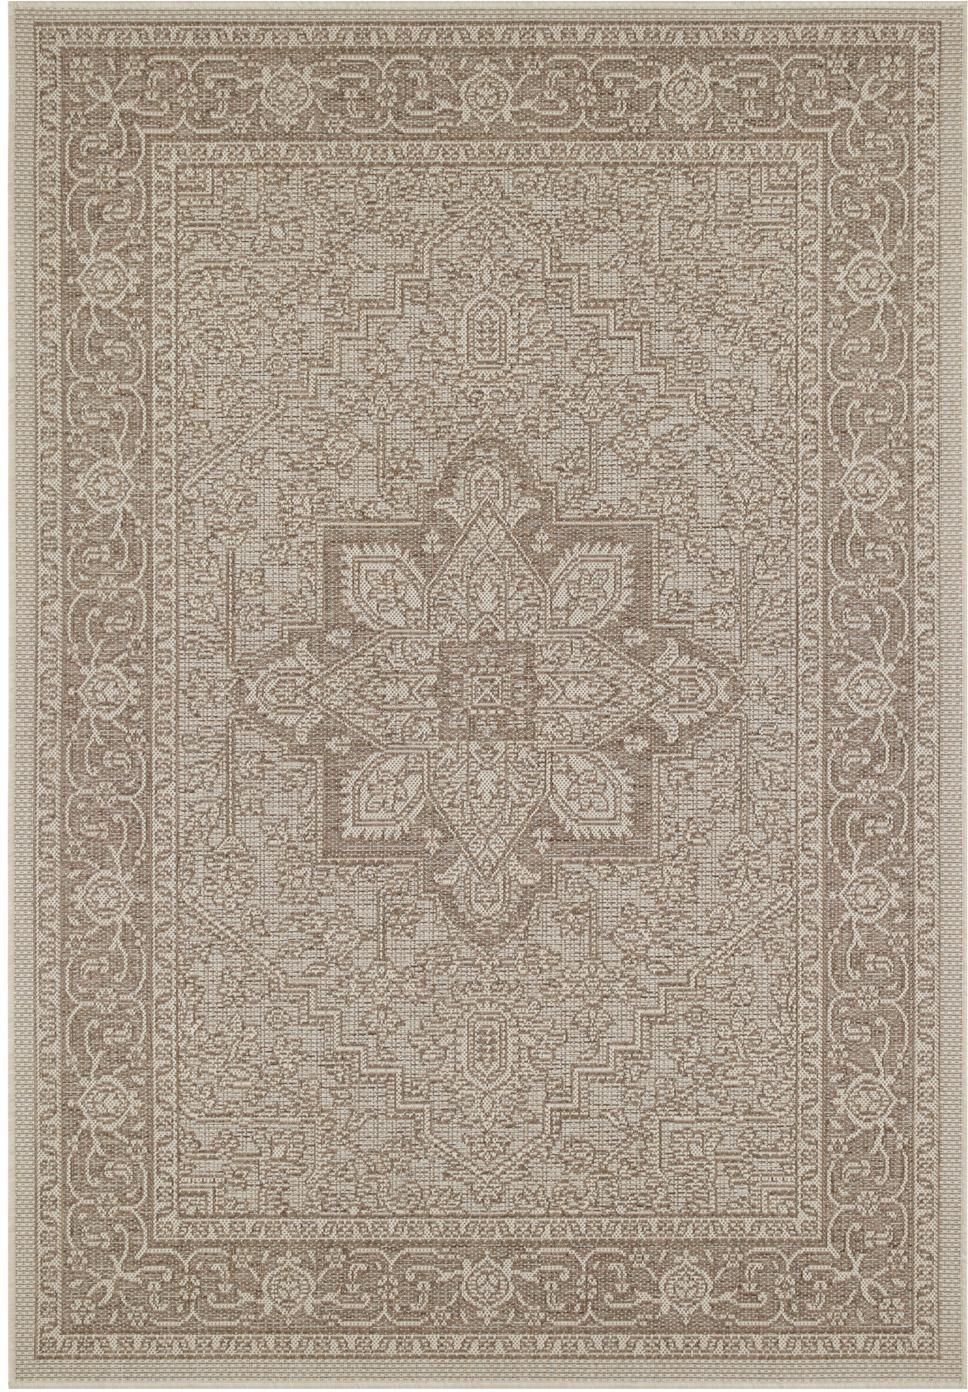 In- & outdoor vloerkleed Anjara in vintage look, Polypropyleen, Taupe, beige, B 200 x L 290 cm (maat L)